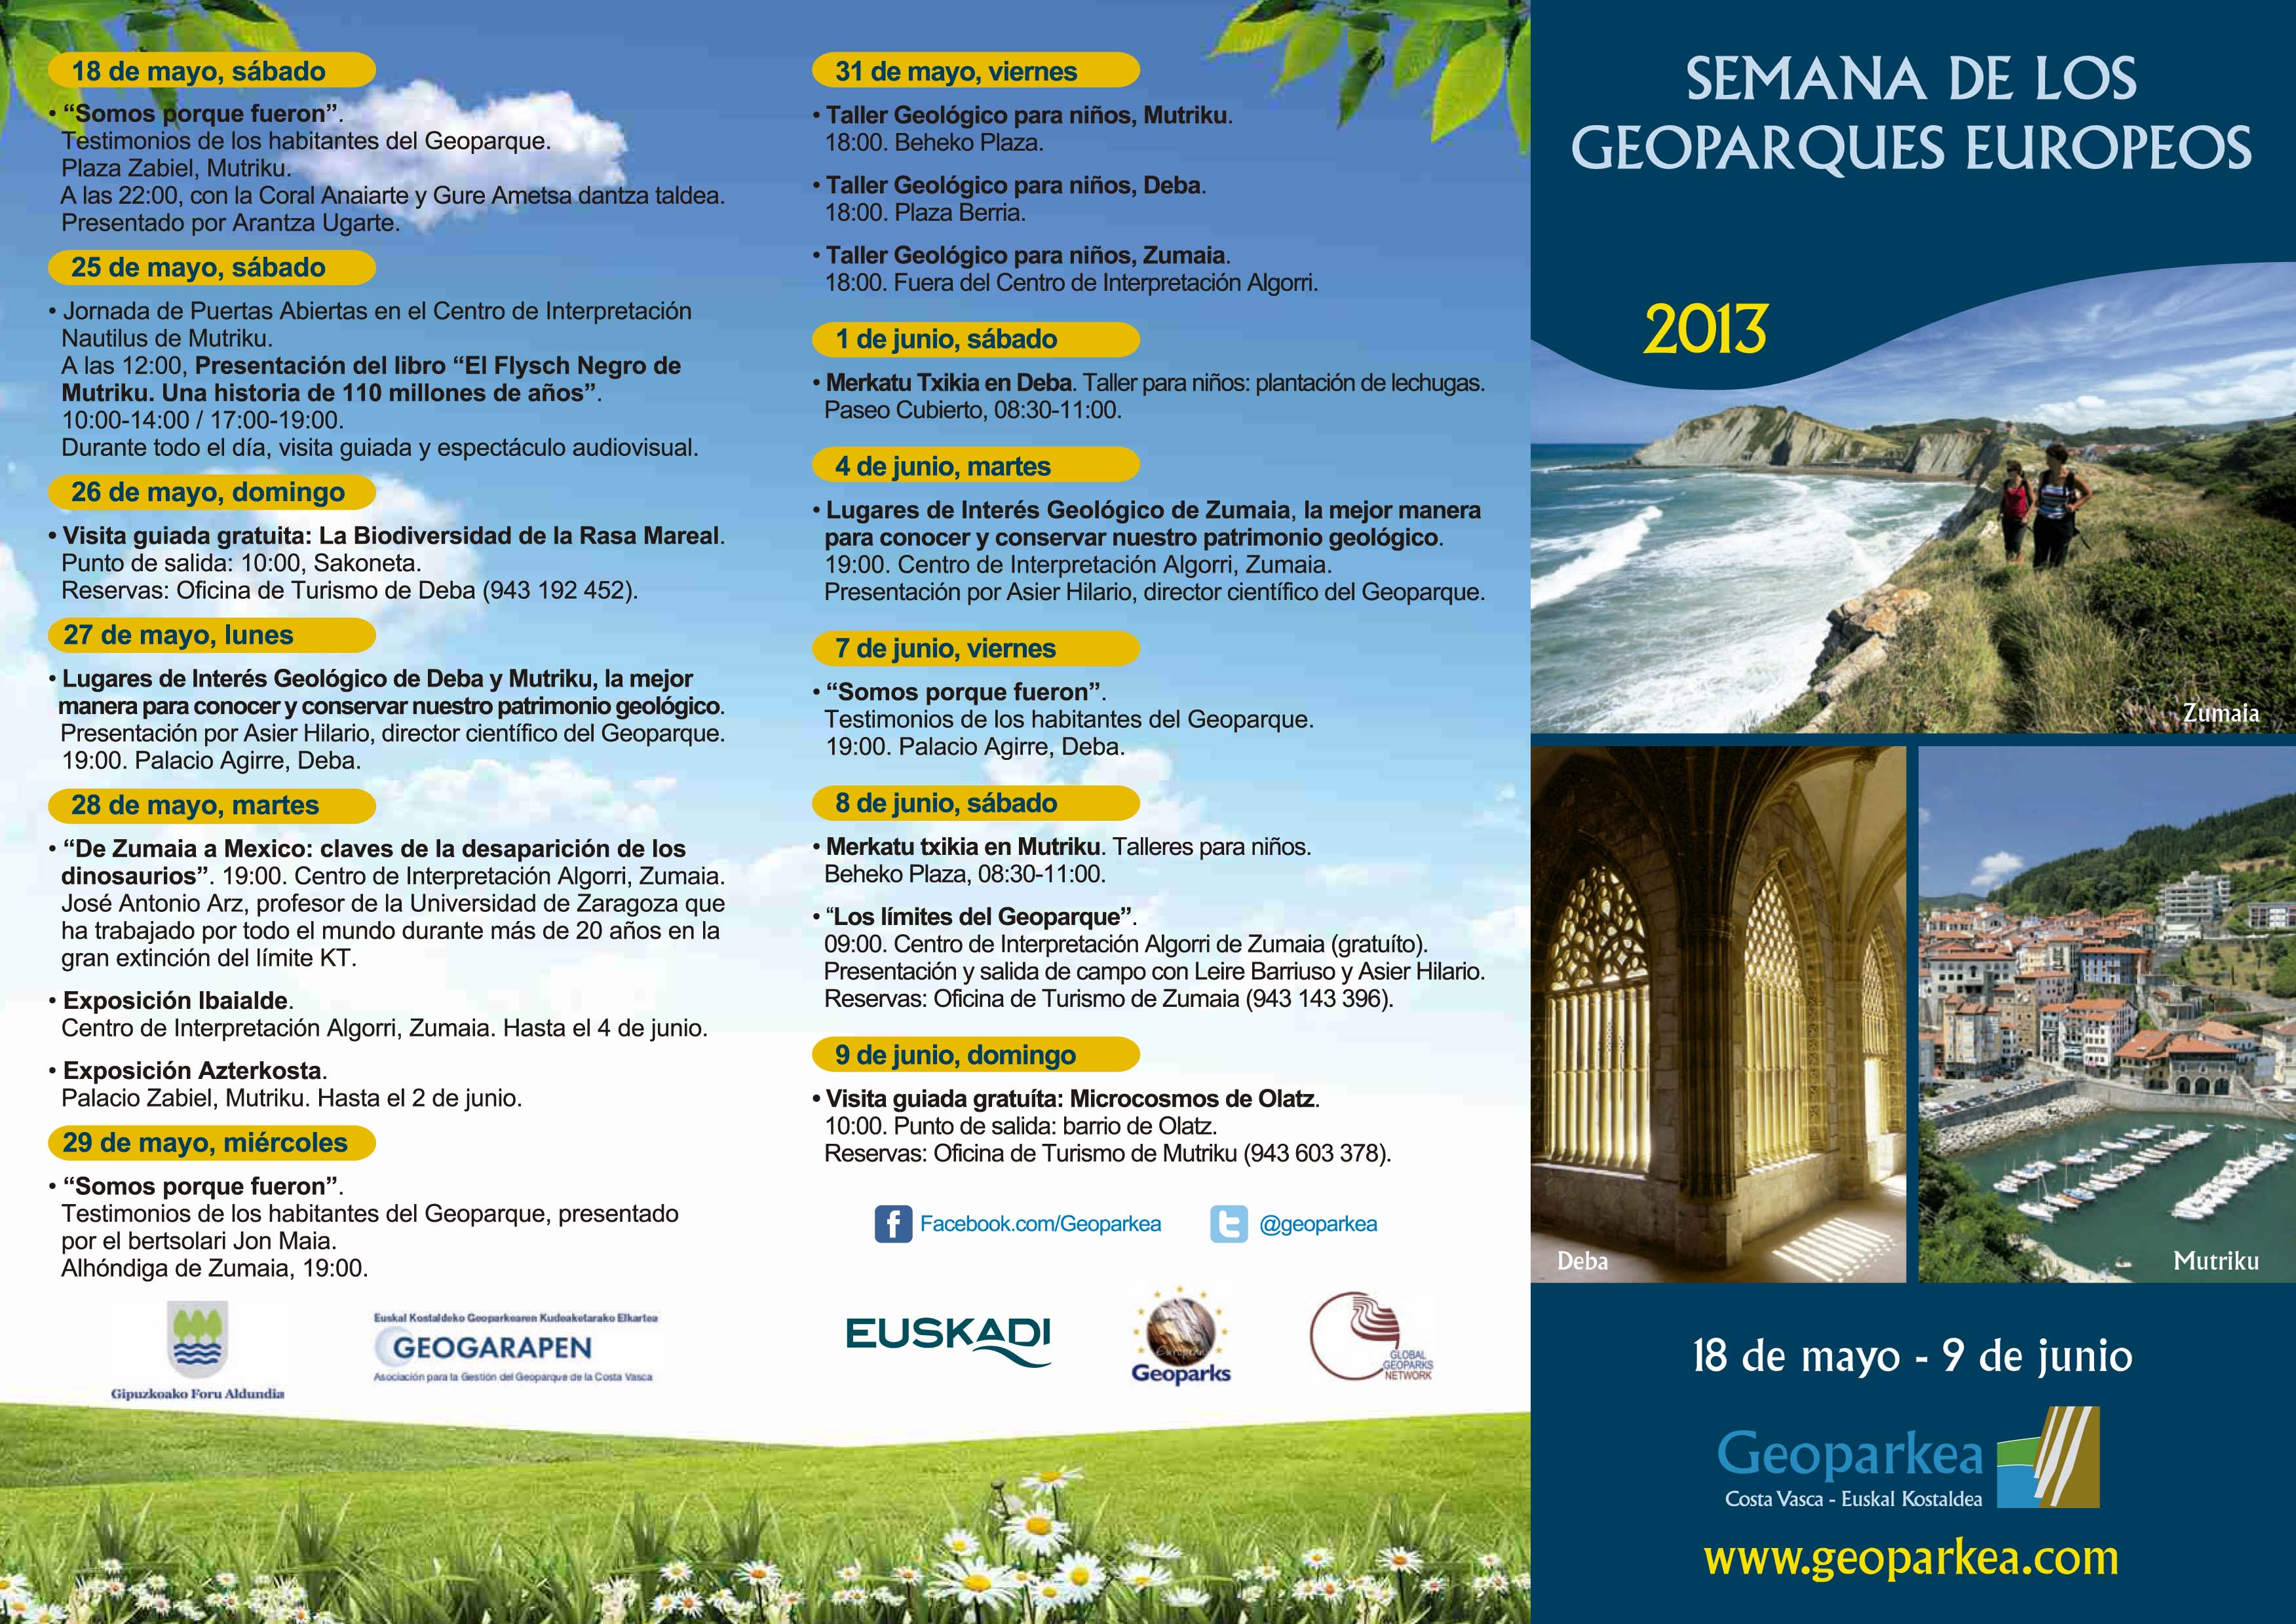 Semana geoparques 2013